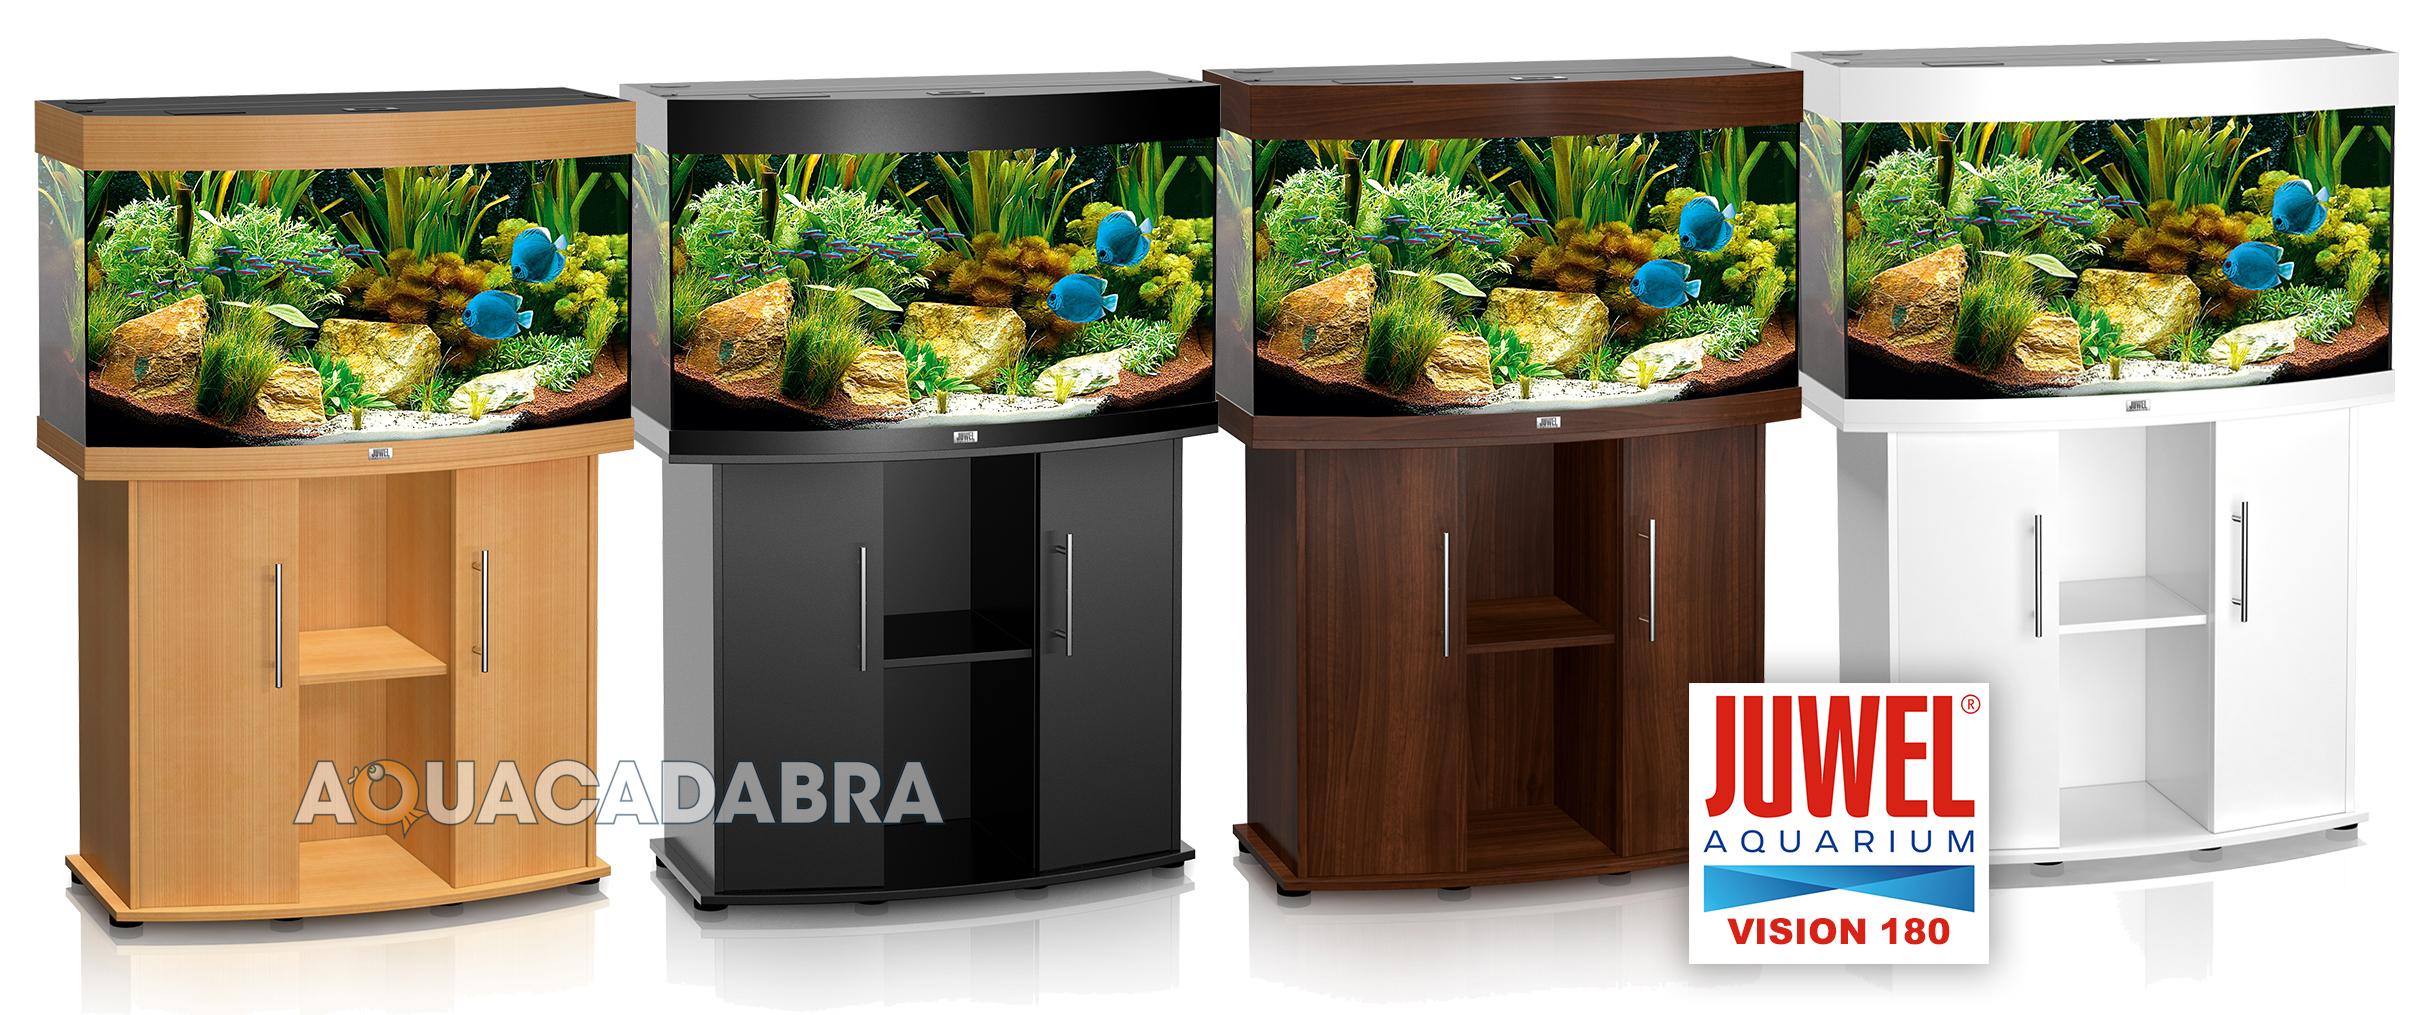 Aquarium fish tank ebay - Juwel Aquarium Fish Tank Cabinet Rio Trigon Vision